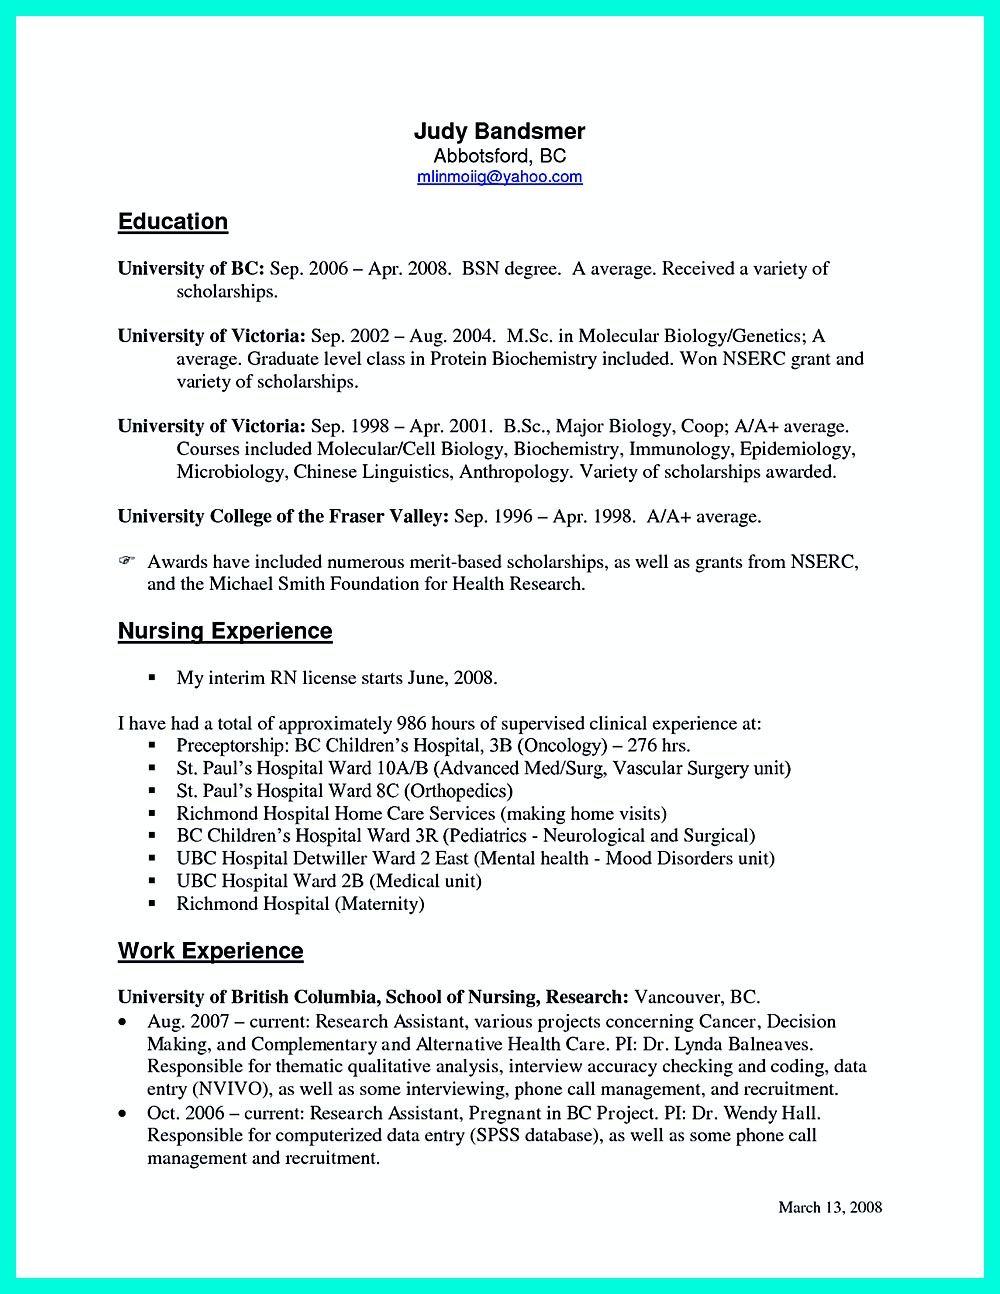 Fein Crna Student Resume Sample Fotos - Entry Level Resume Vorlagen ...